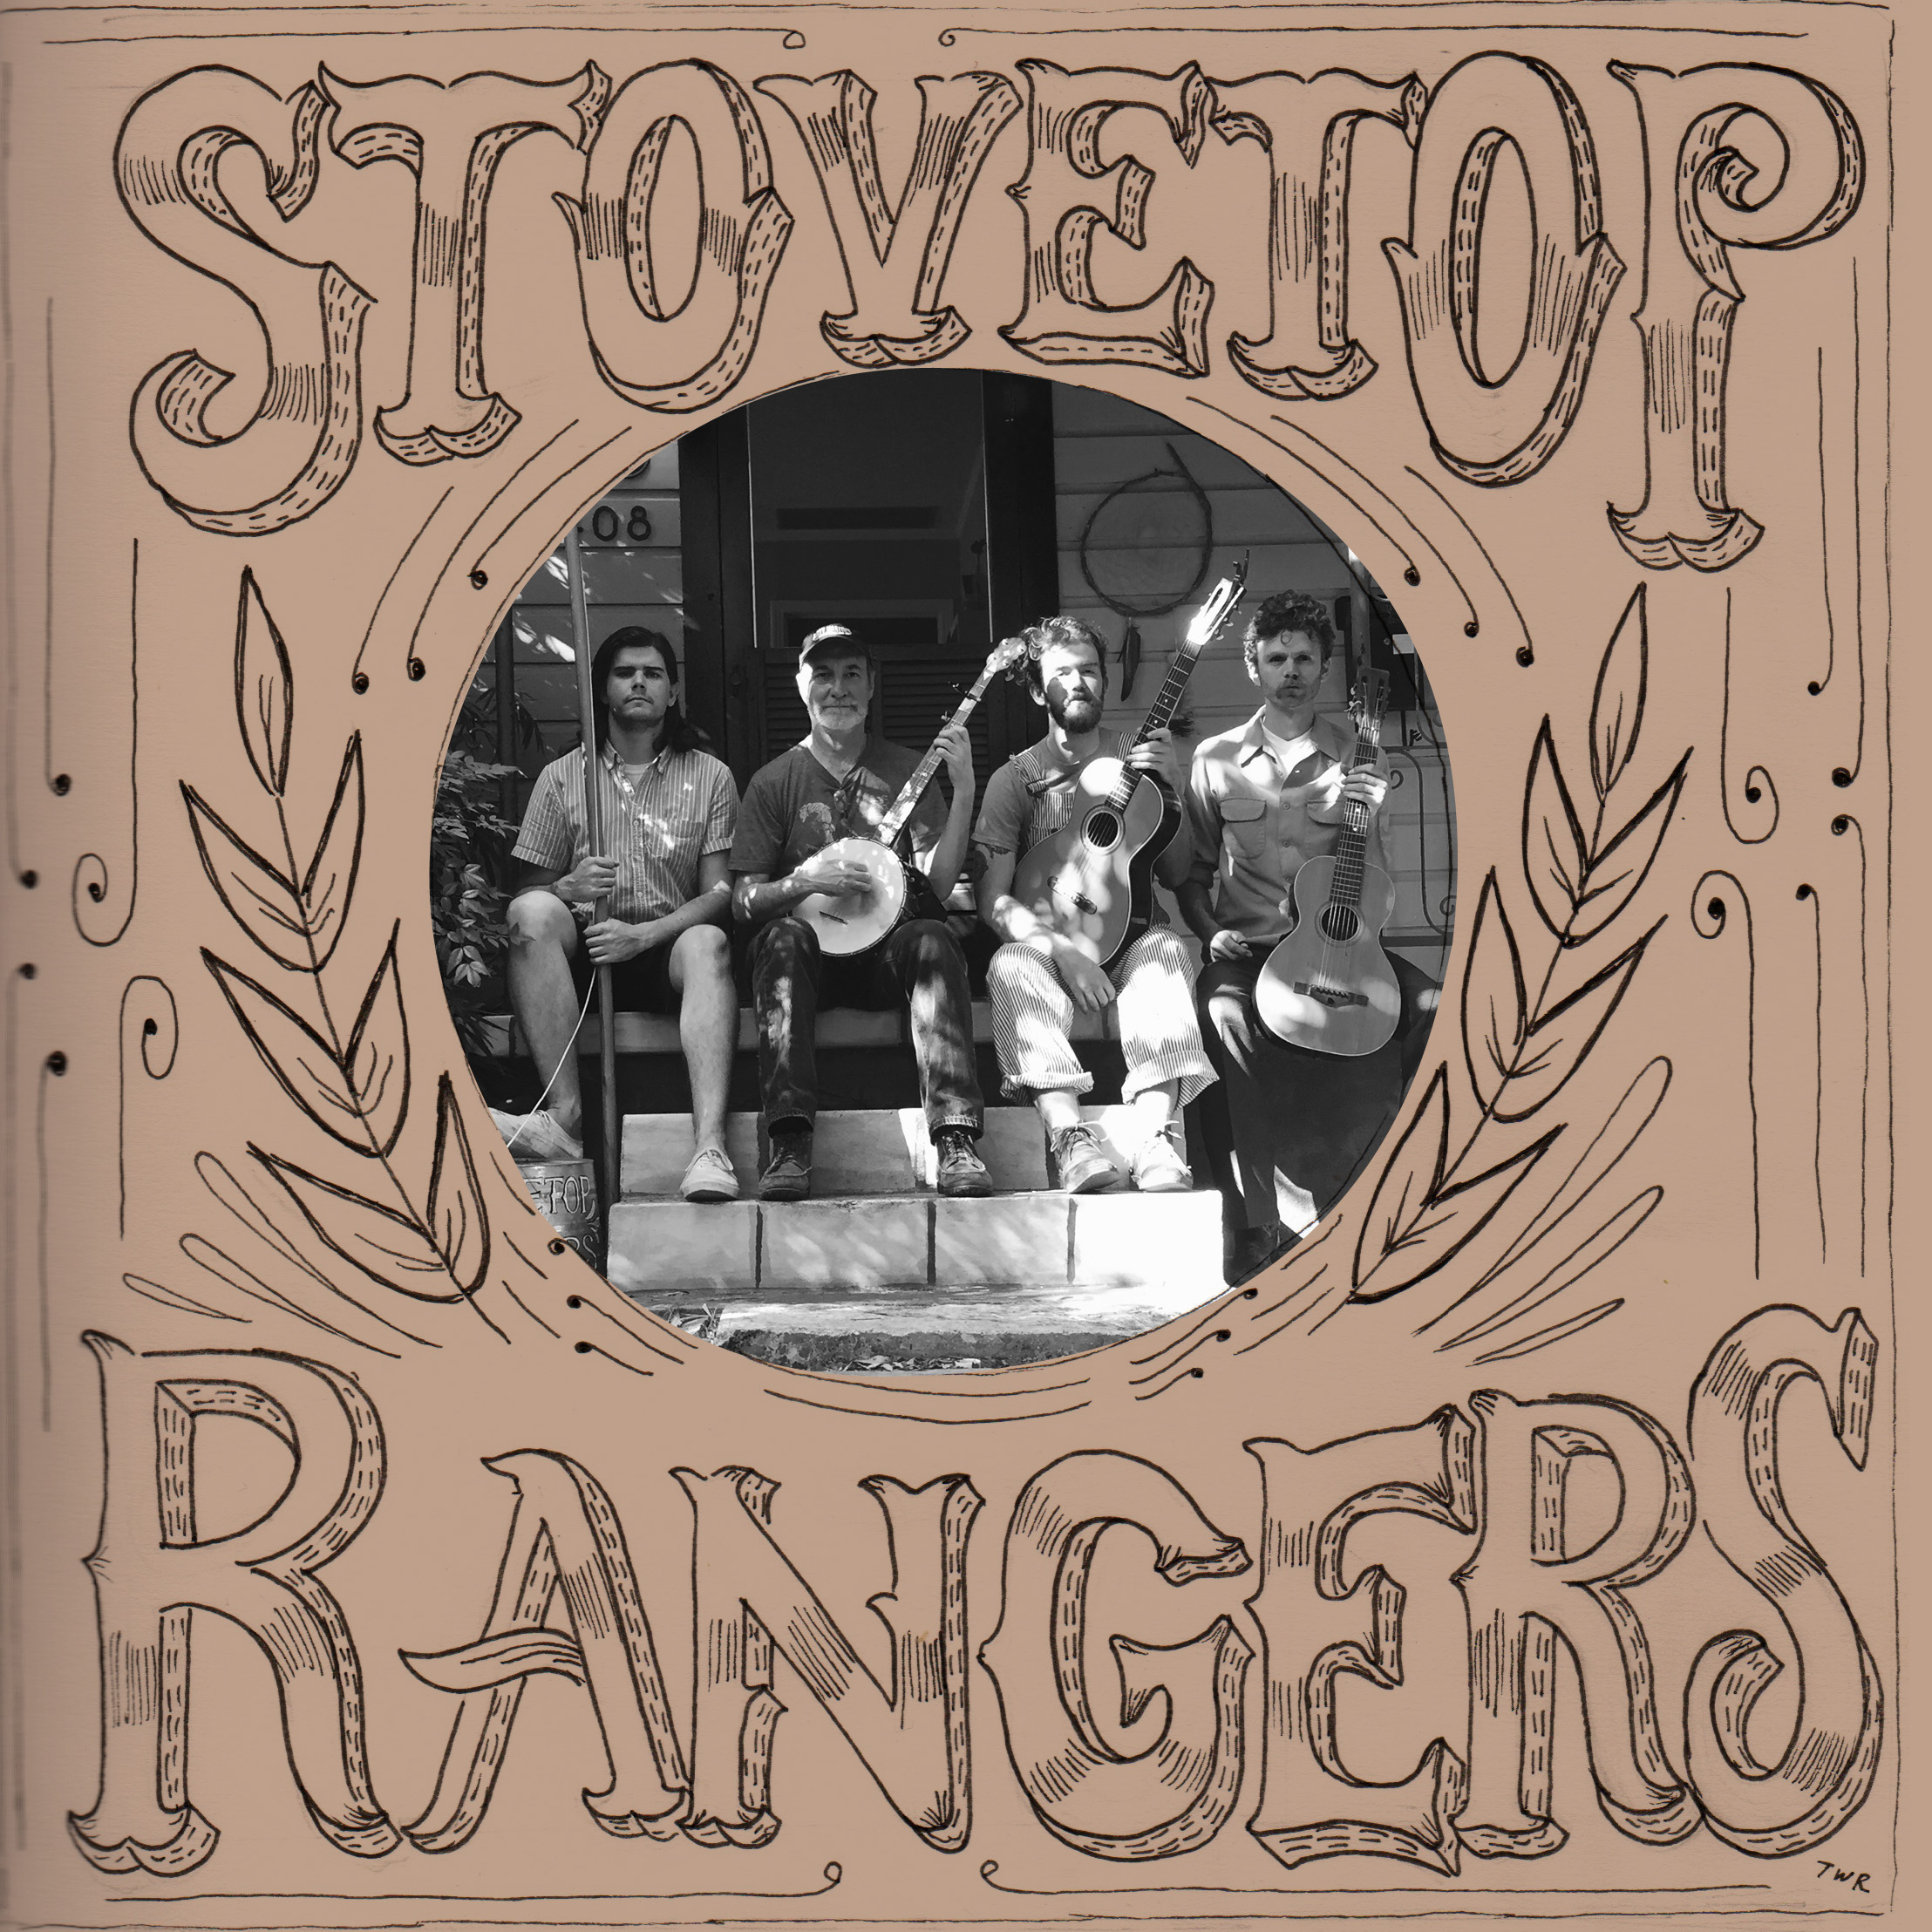 STOVETOP RANGERS